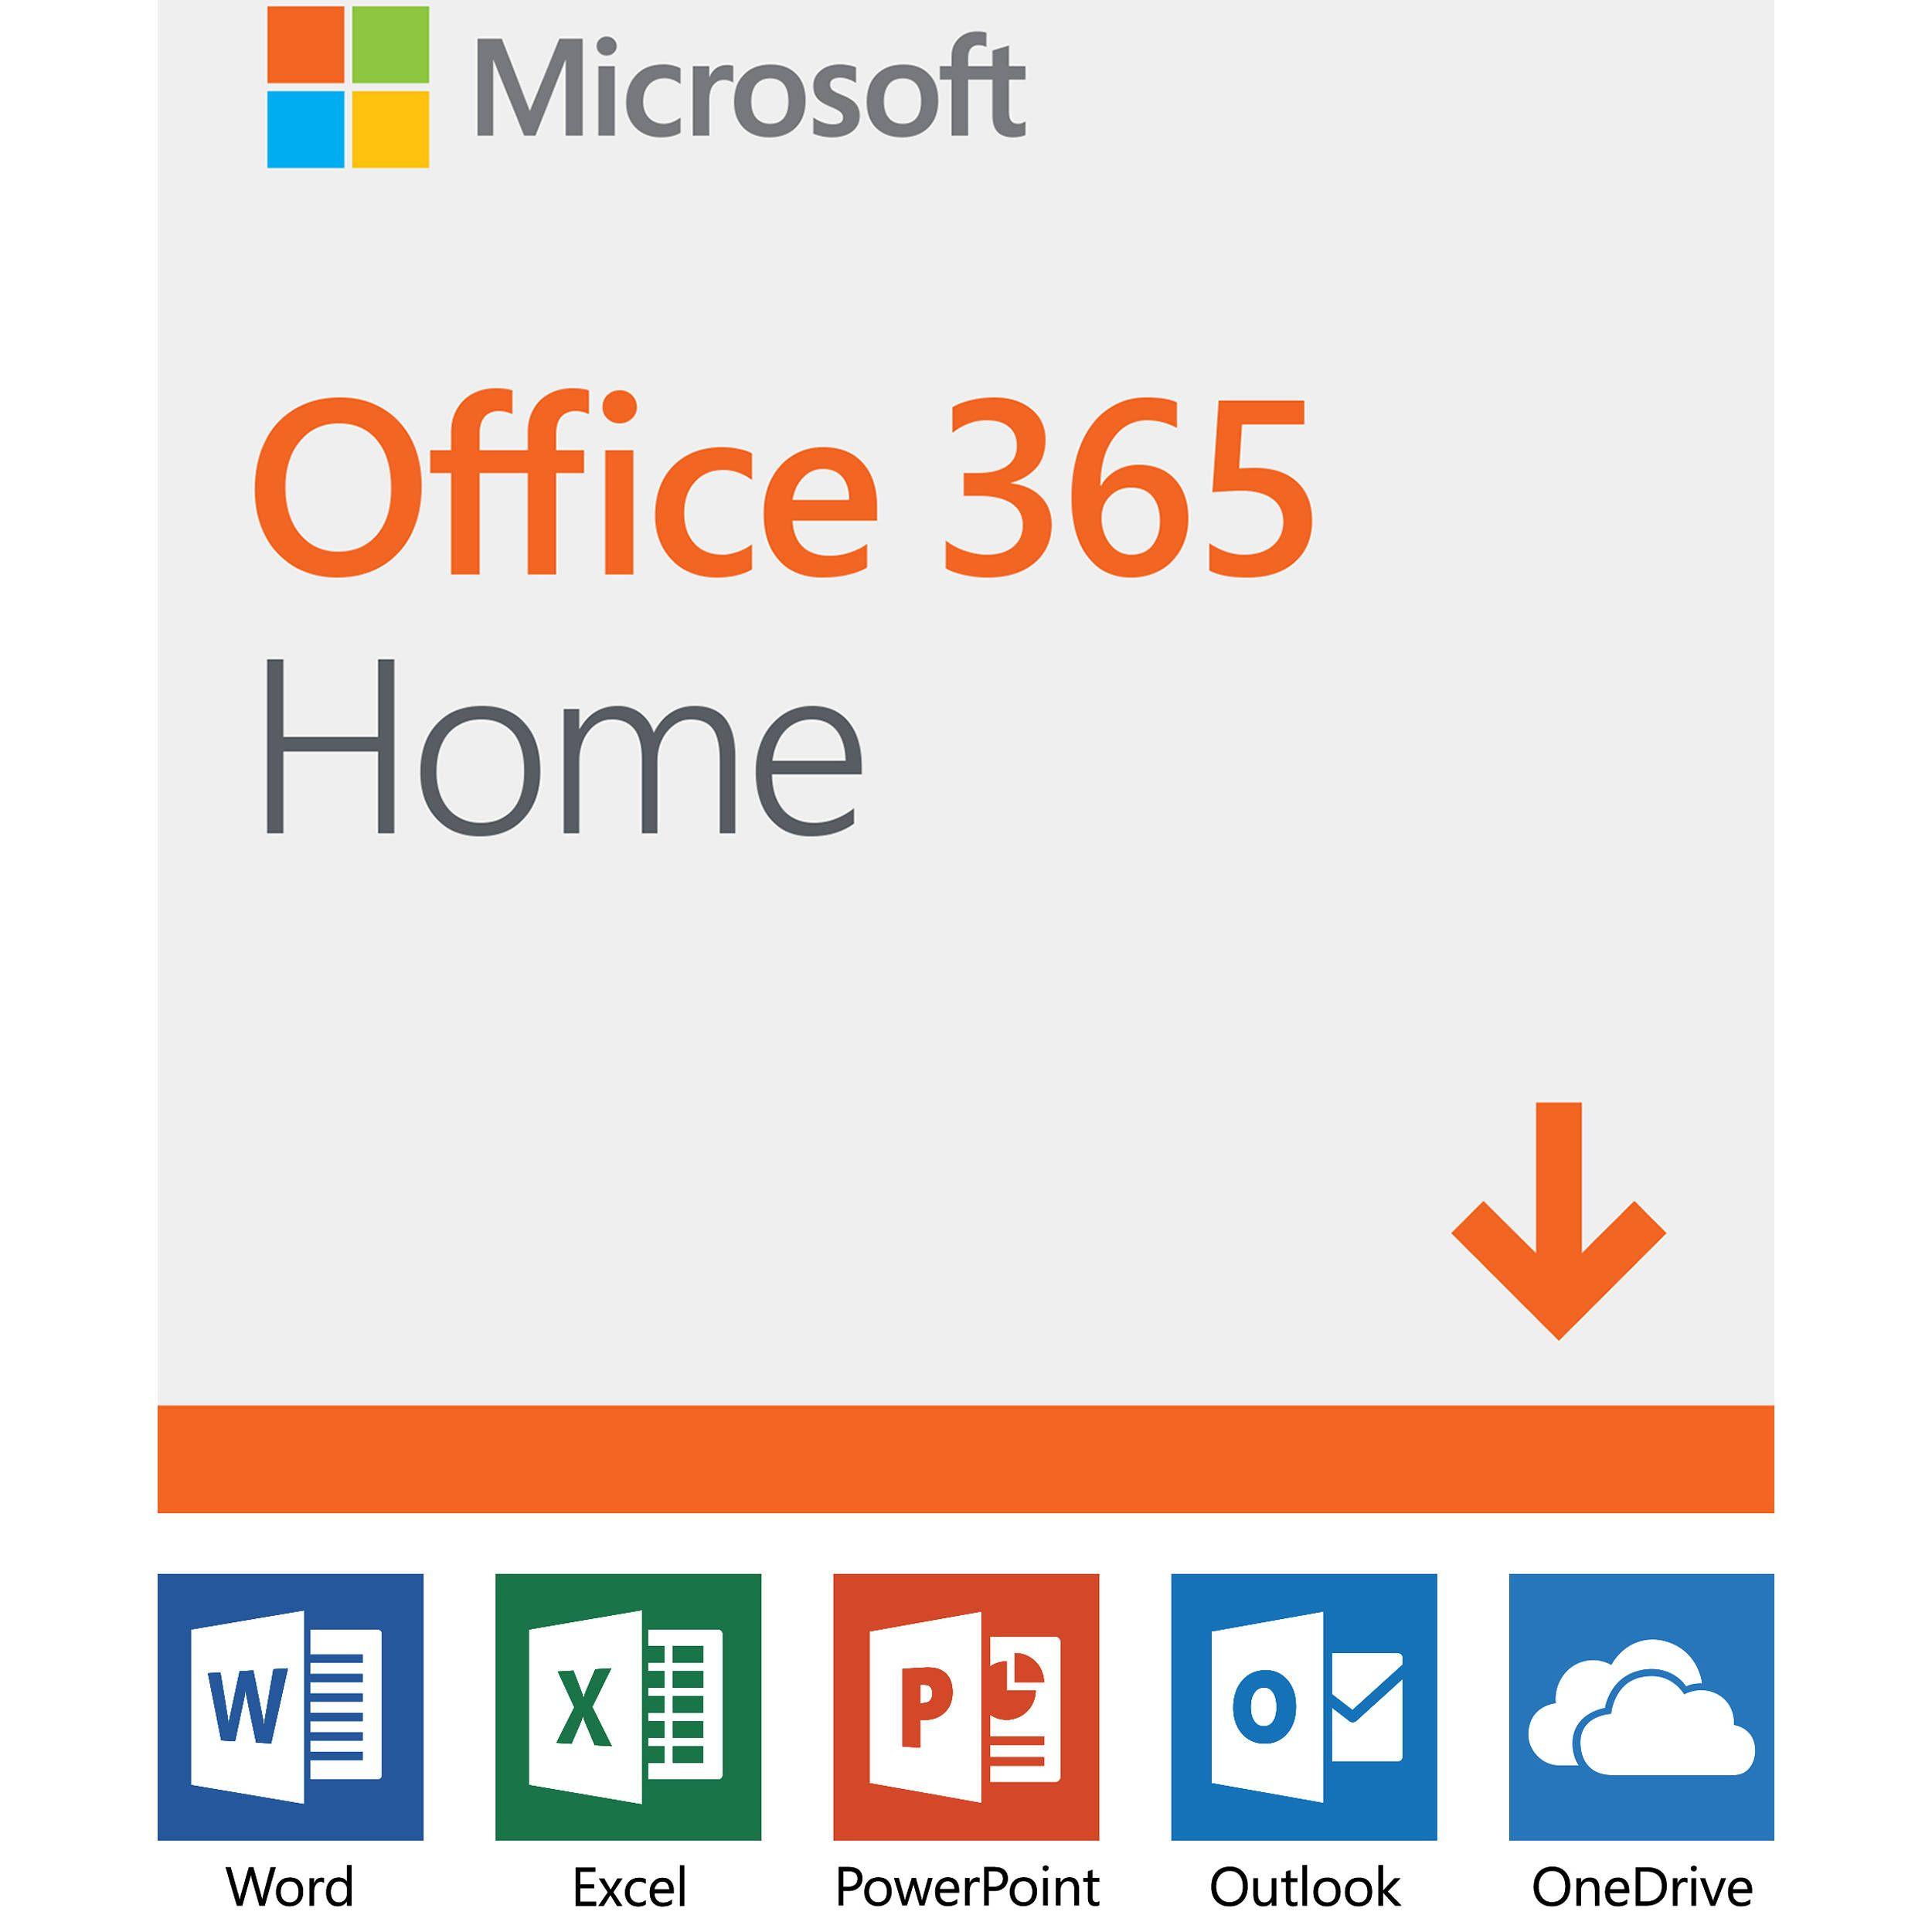 Microsoft Office By Ennadifi1 On Ebay Microsoft Microsoft